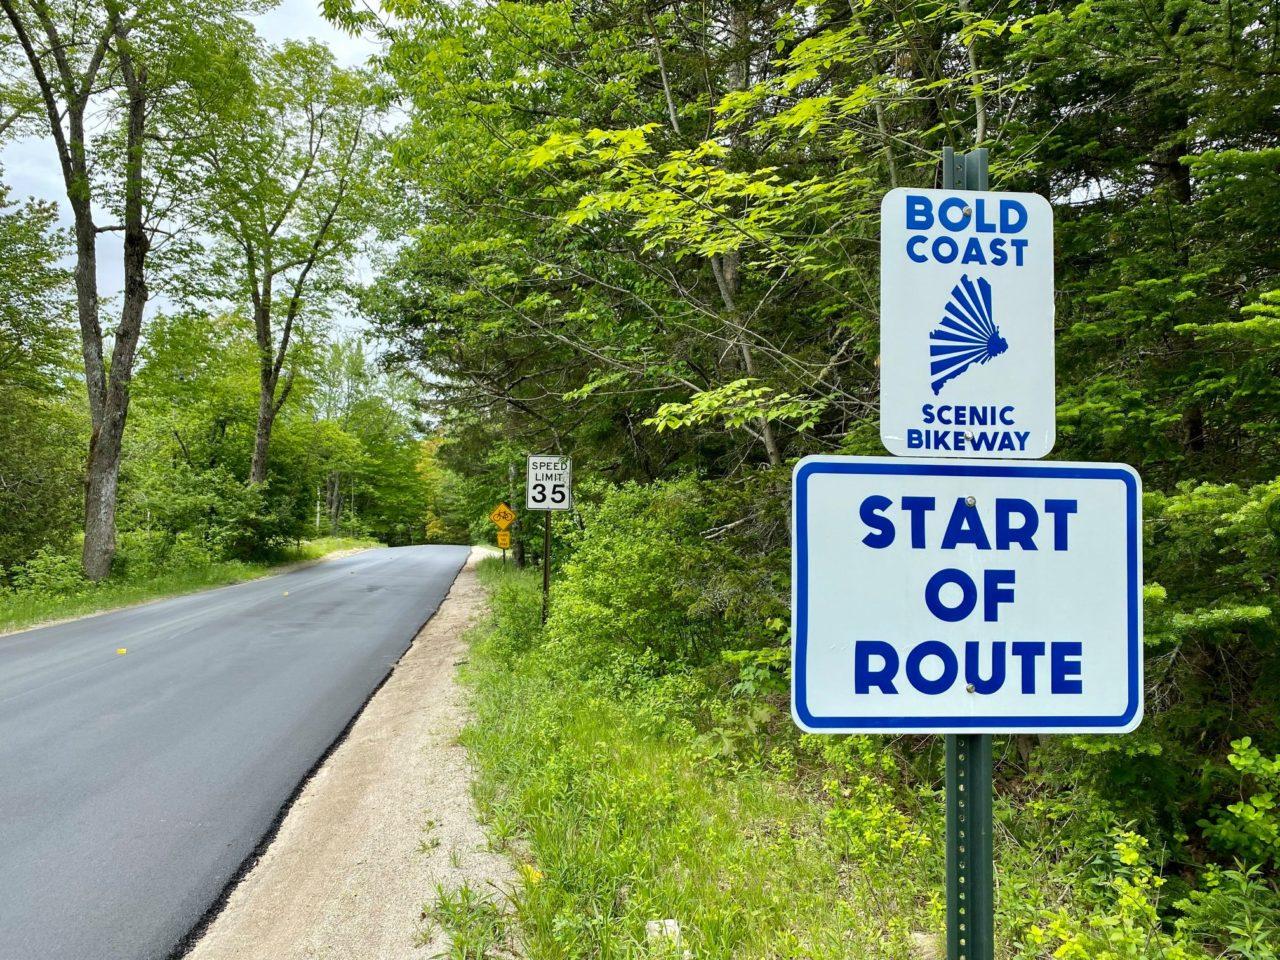 camping-bold-coast-bikeway